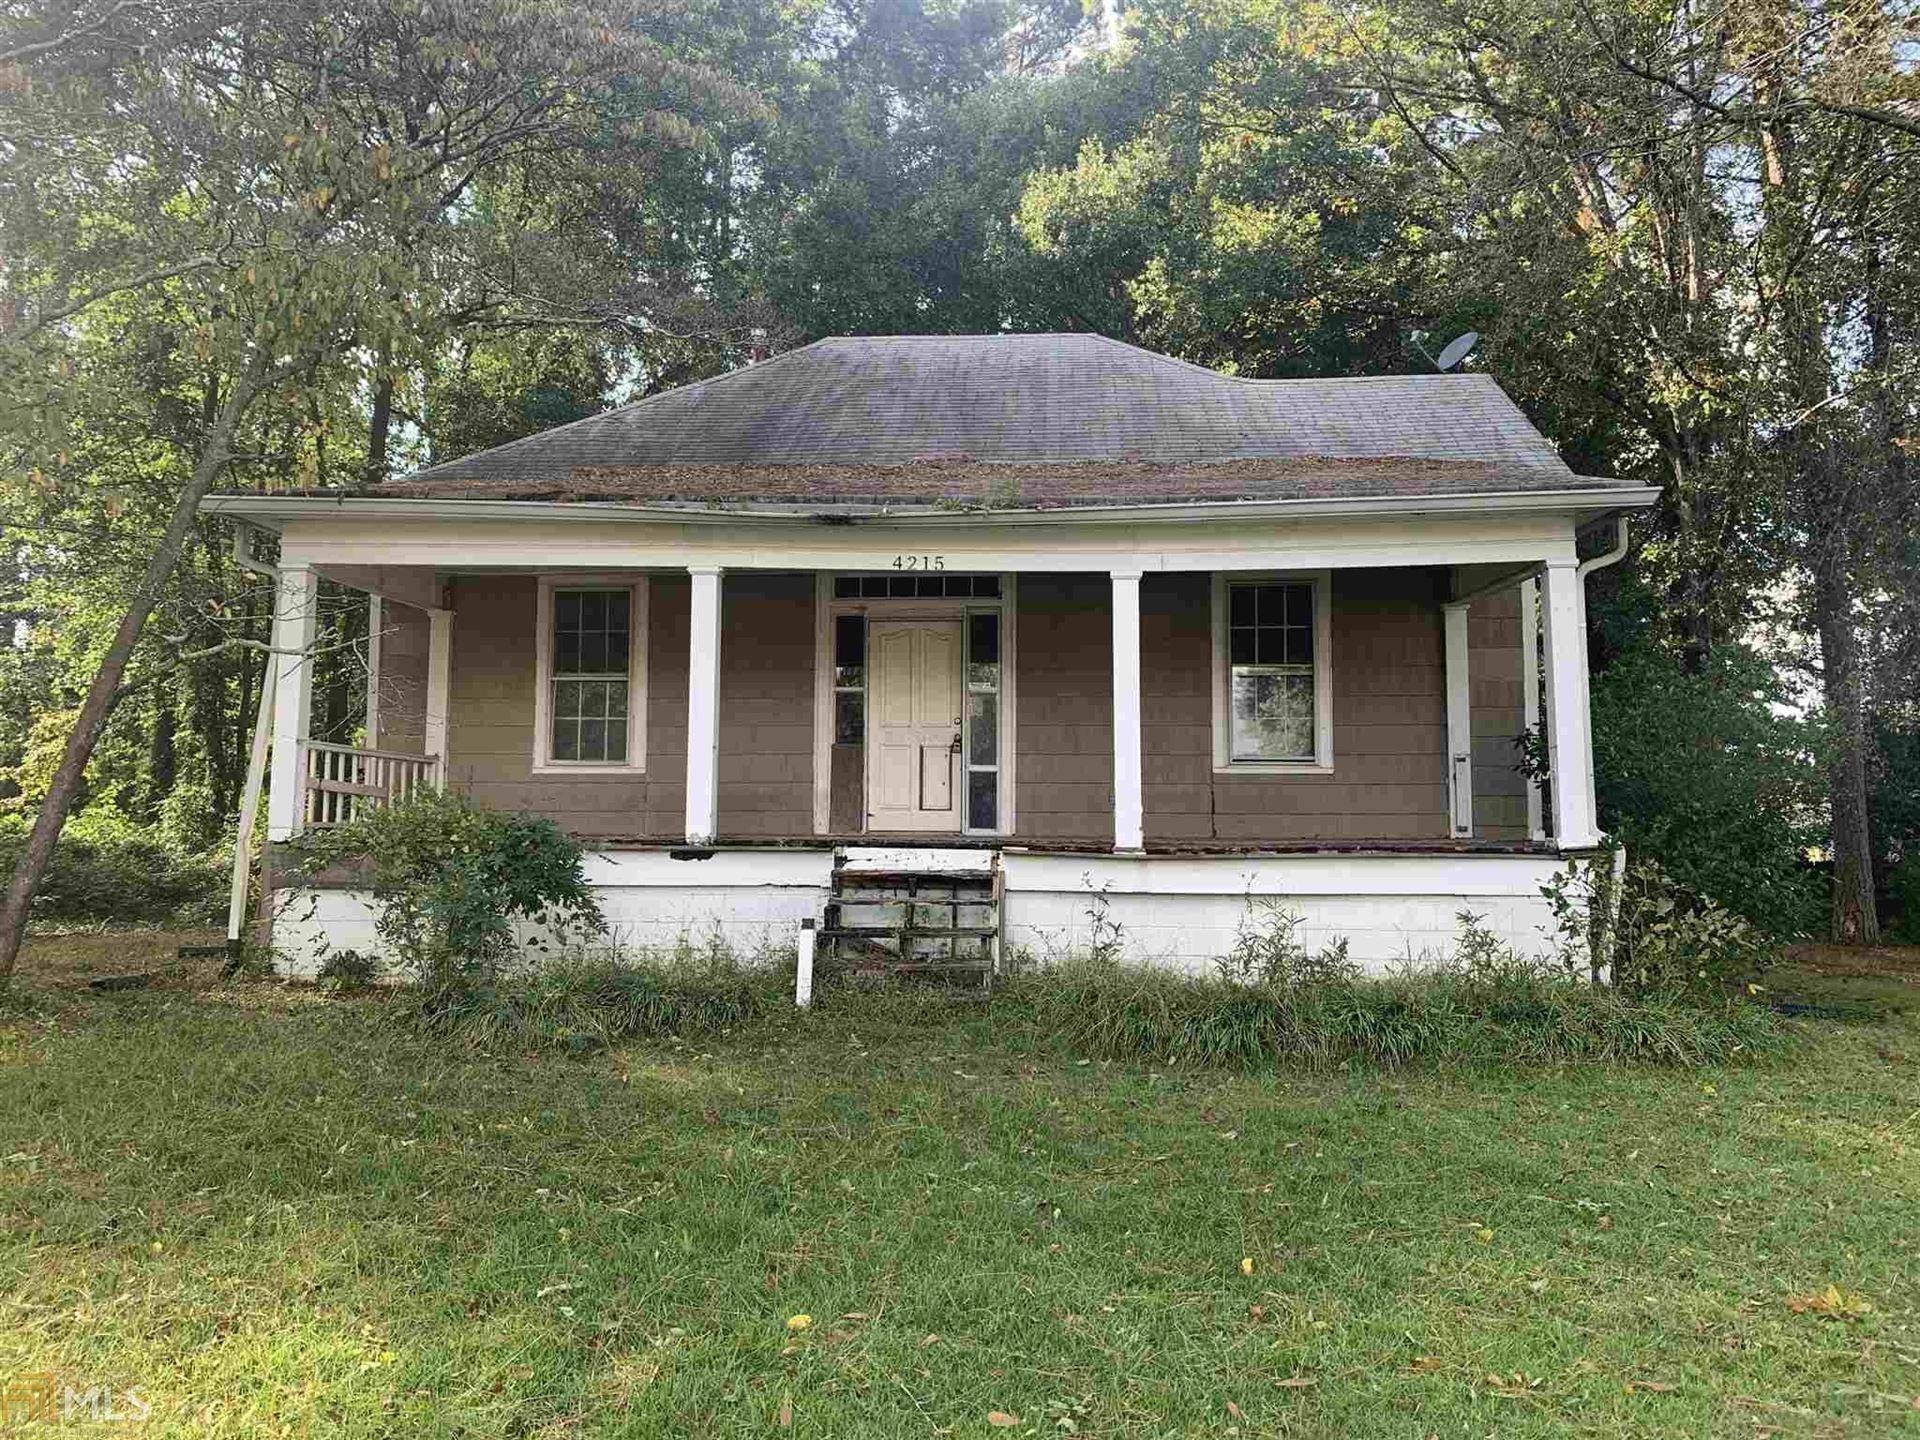 4215 Old Rock Cut Rd, Conley, GA 30288 - MLS#: 8877153